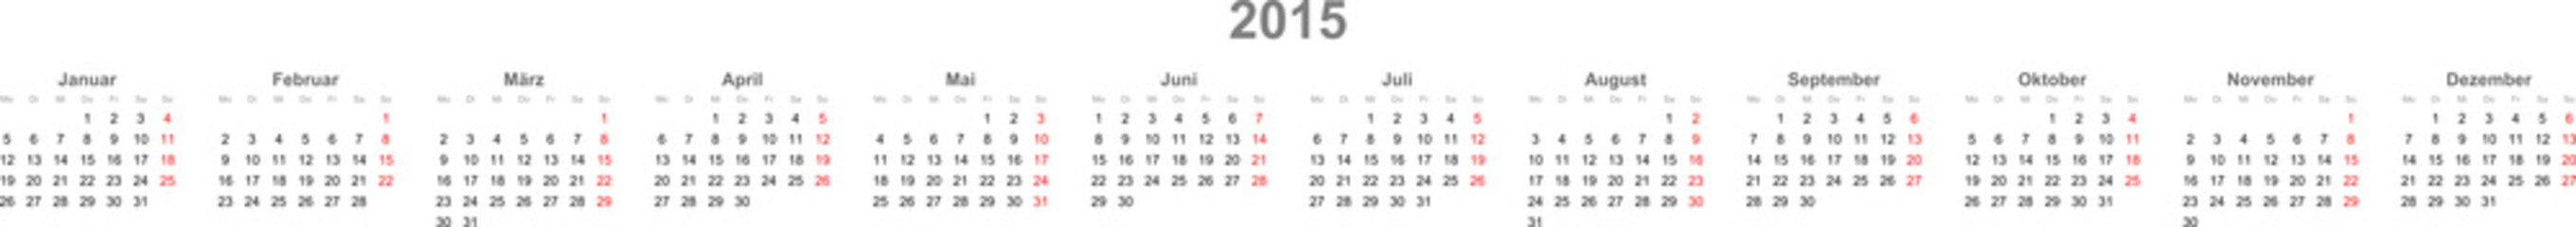 Kalender Zeile 2015